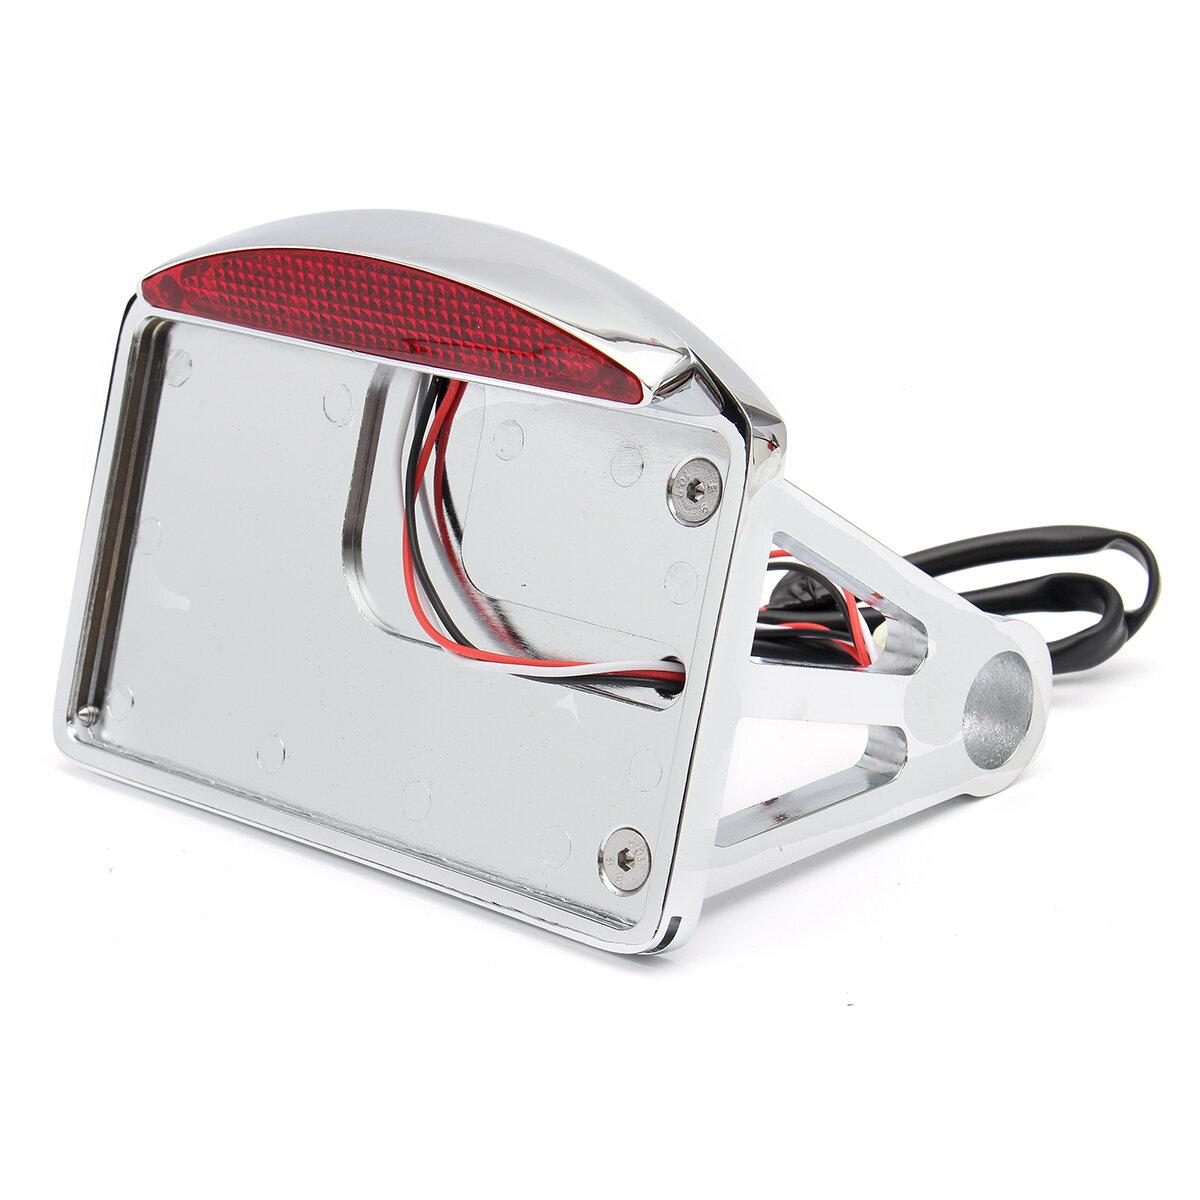 DC 12-24V Warning Light E9 + Flashing LED Beacon Flexble Din Pole Tractor Warning Light - 1